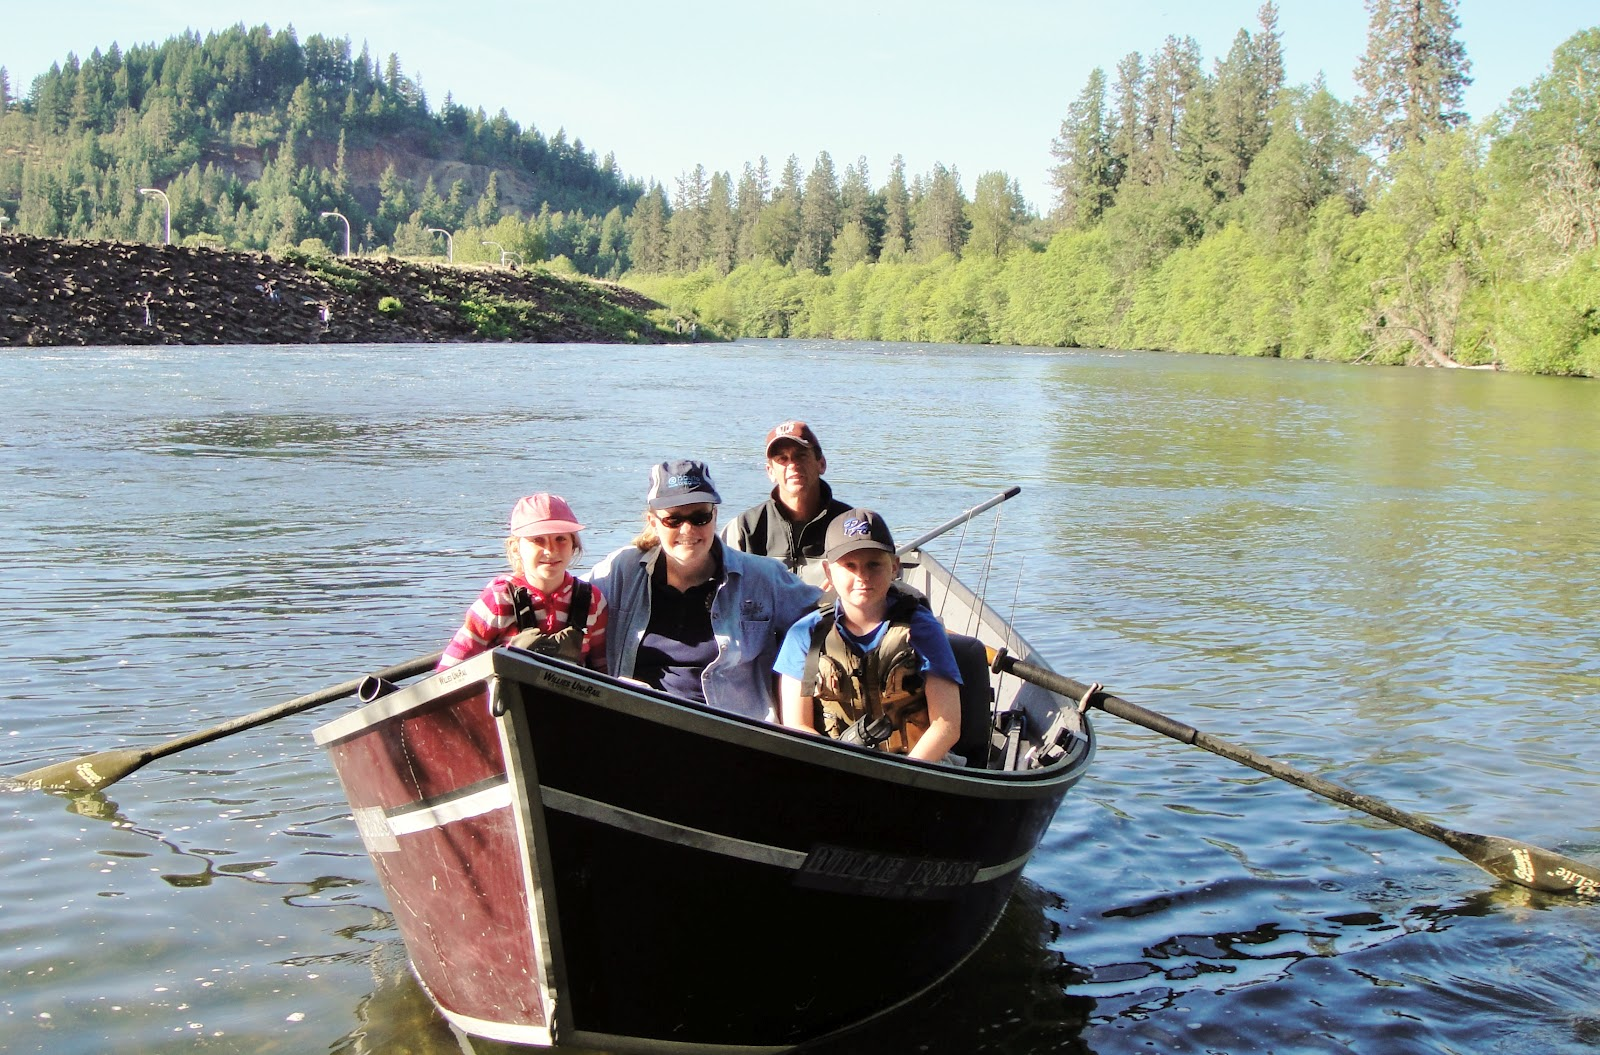 Summer vacation summer steelhead rogue river fishing for Rogue river fishing report